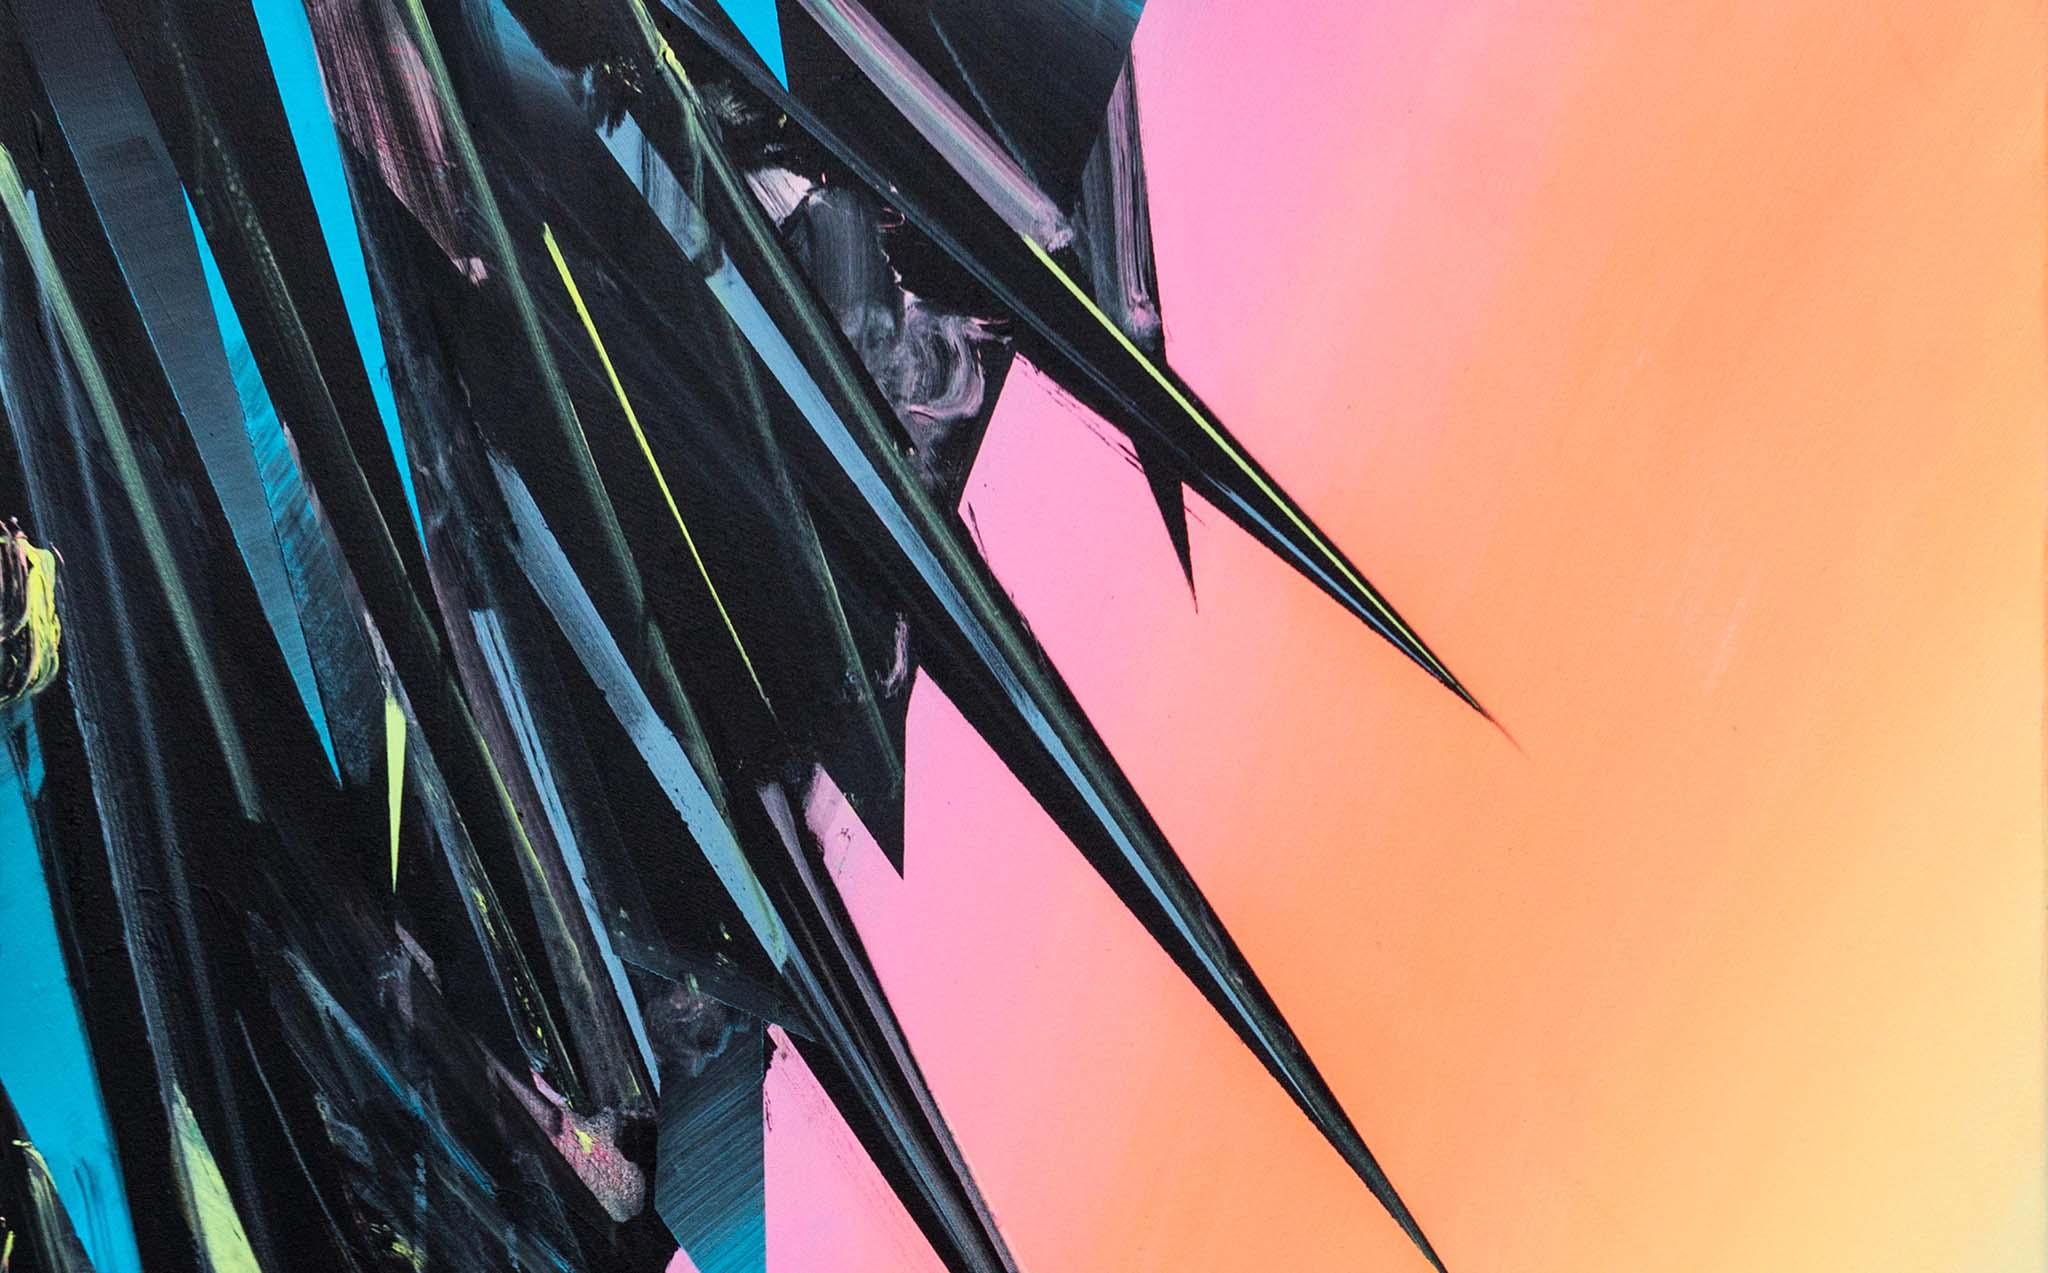 Phil Ashcroft, Ramsey Bay (Sunset Version), acrylic on canvas, 122 x 92cm, 2014, photo: Joe Plommer